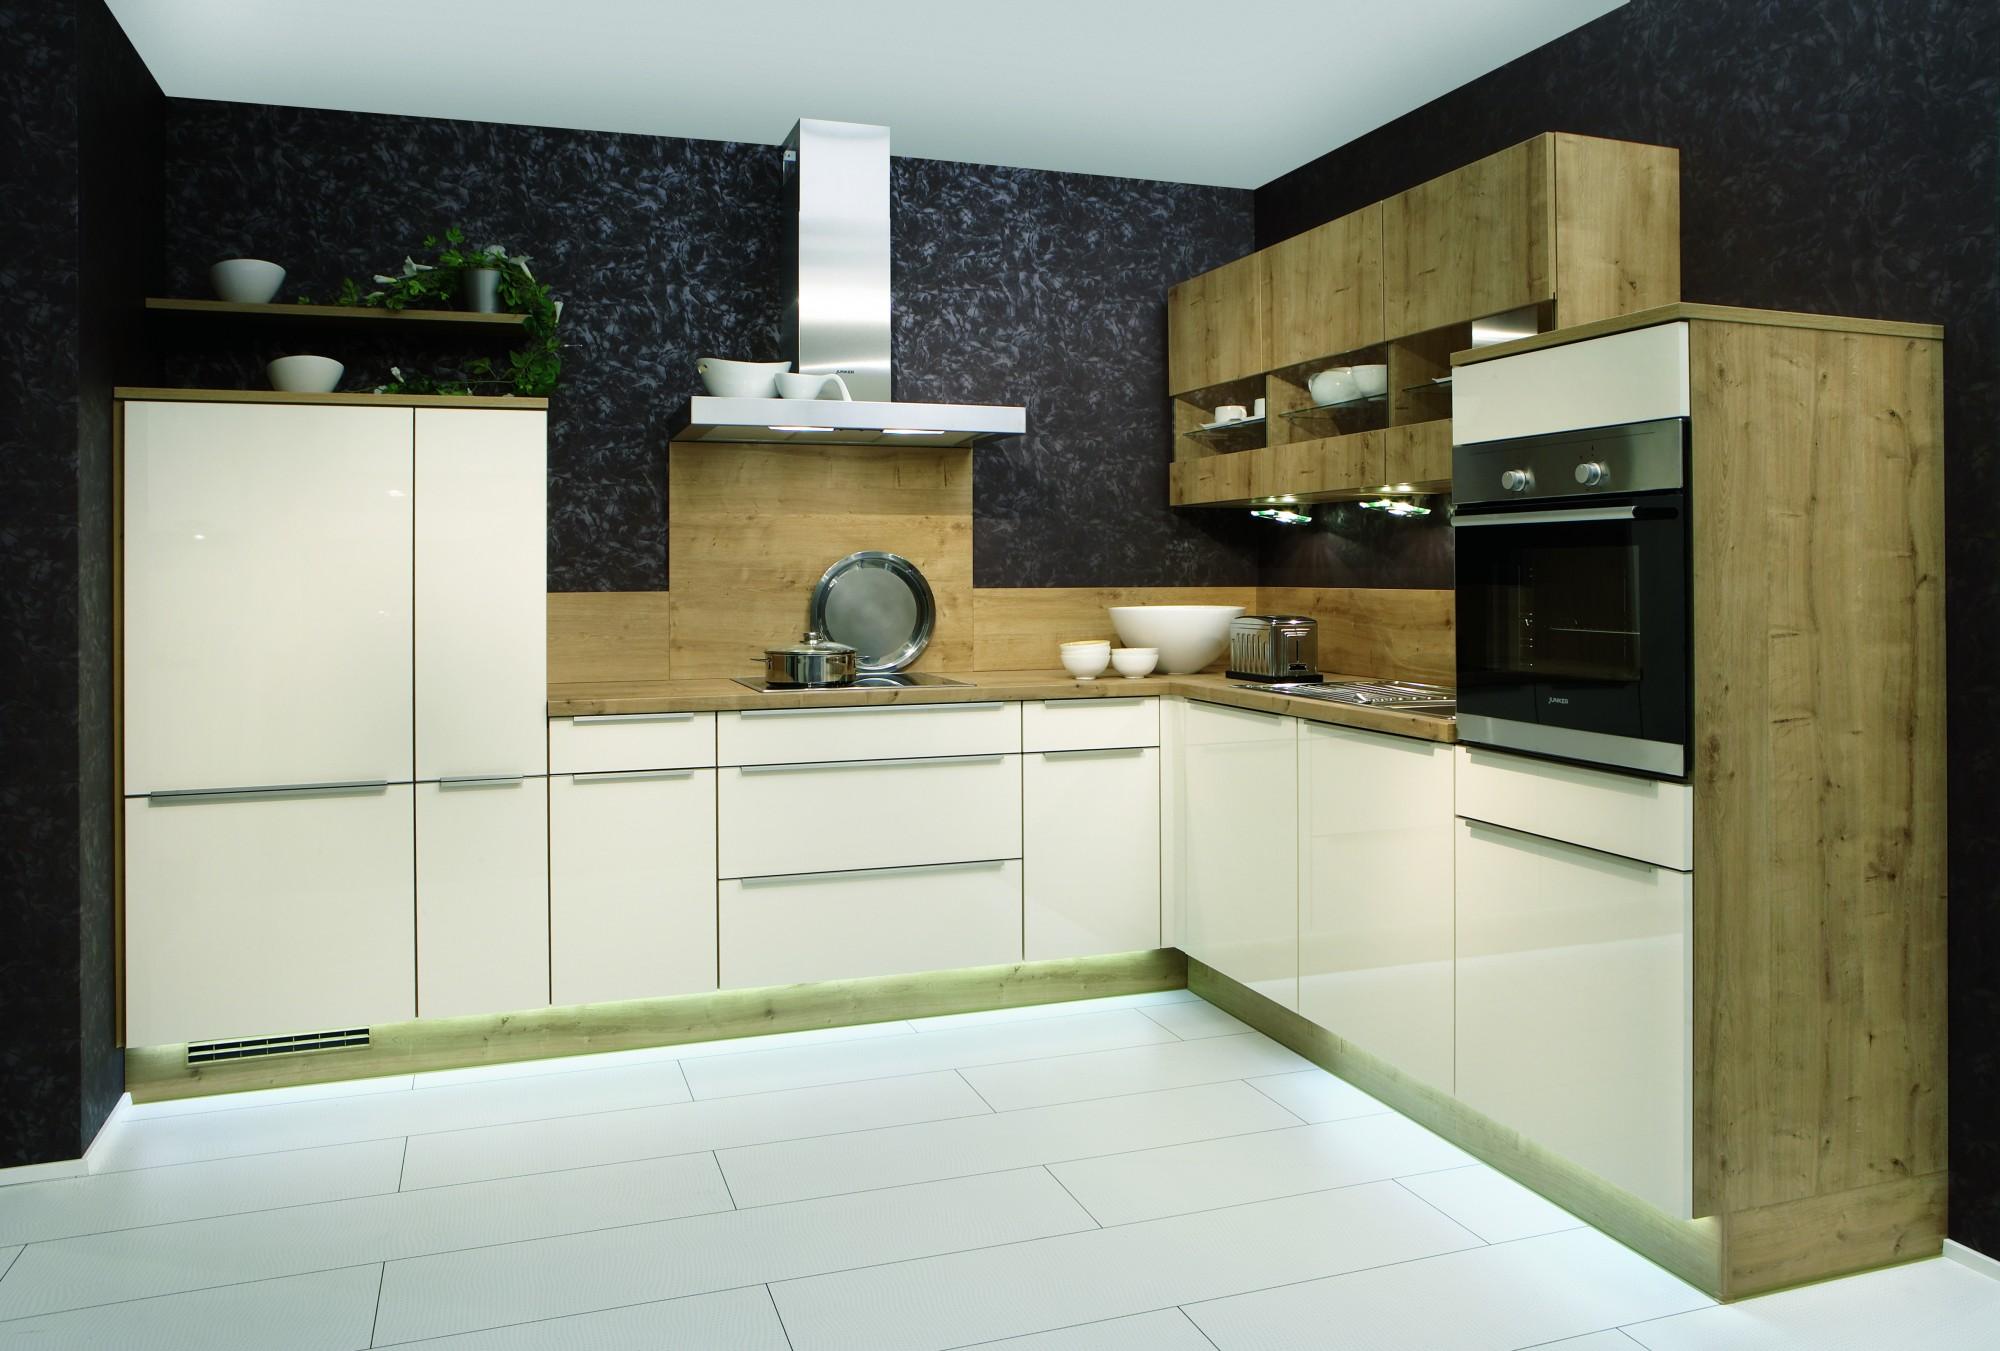 k che focus 462 k chenstudio leipzig zwenkau borna. Black Bedroom Furniture Sets. Home Design Ideas